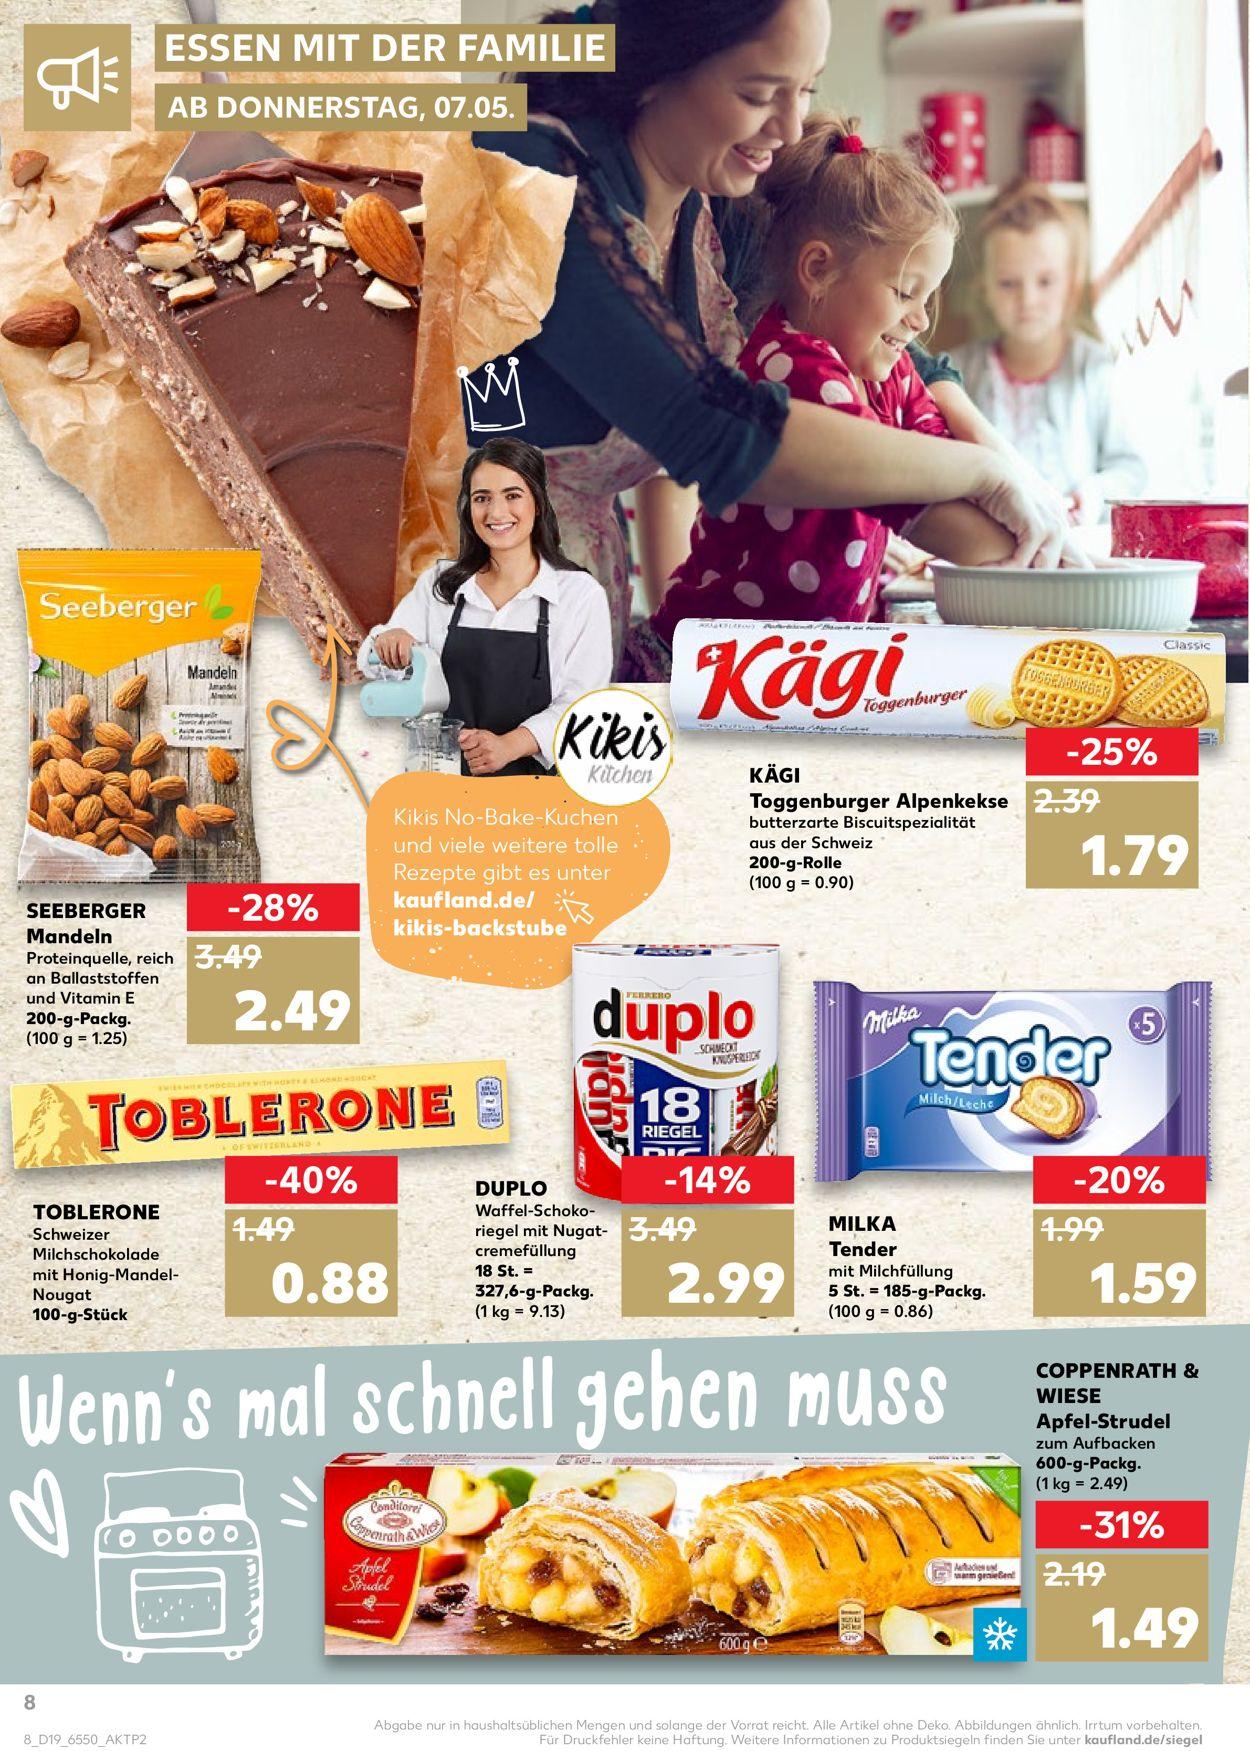 Kaufland Prospekt - 07.05 - 13.05.2020 (Seite 8) | Rabato